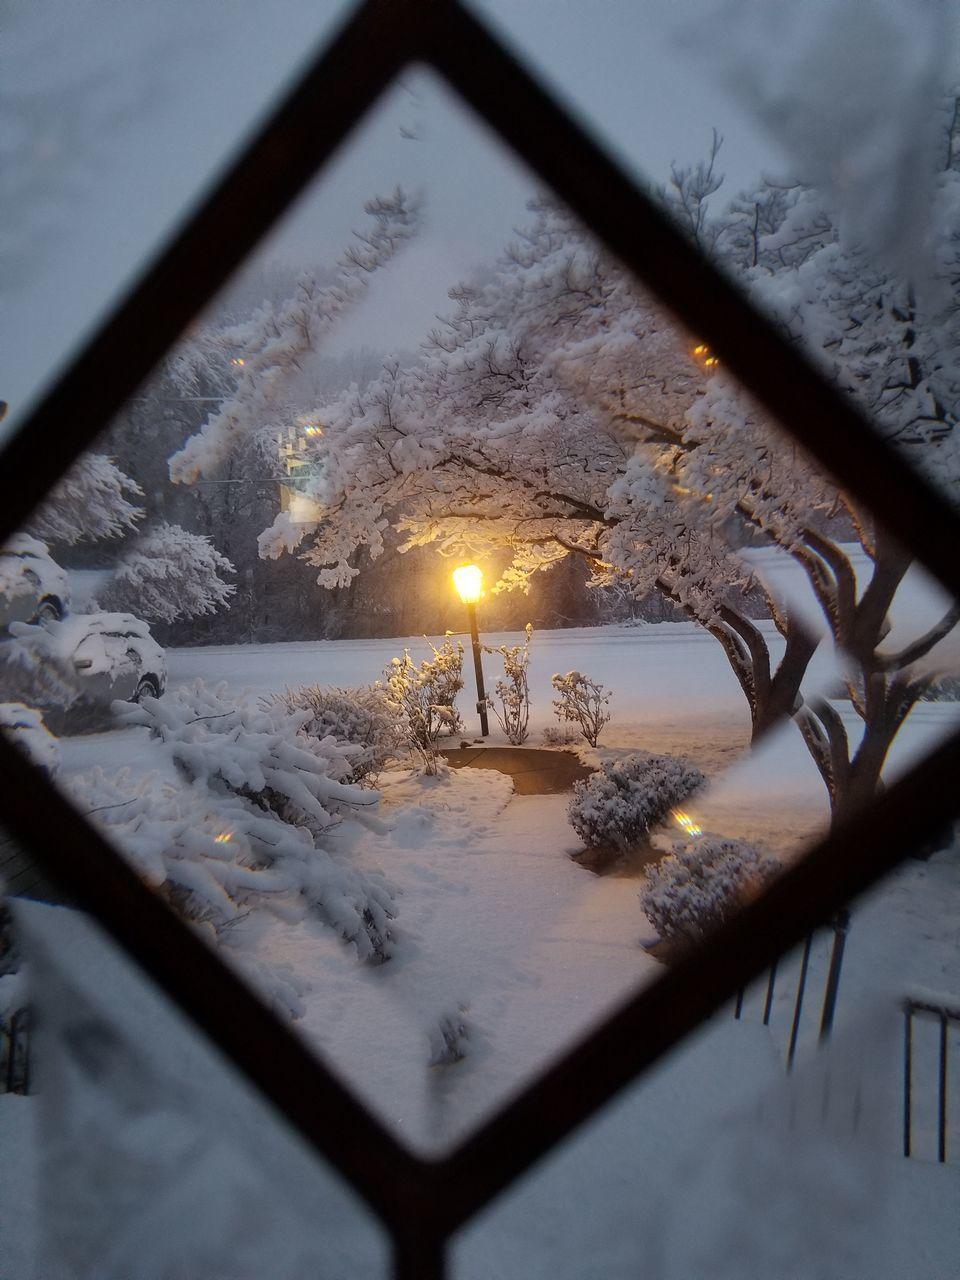 VIEW OF ILLUMINATED GLASS WINDOW